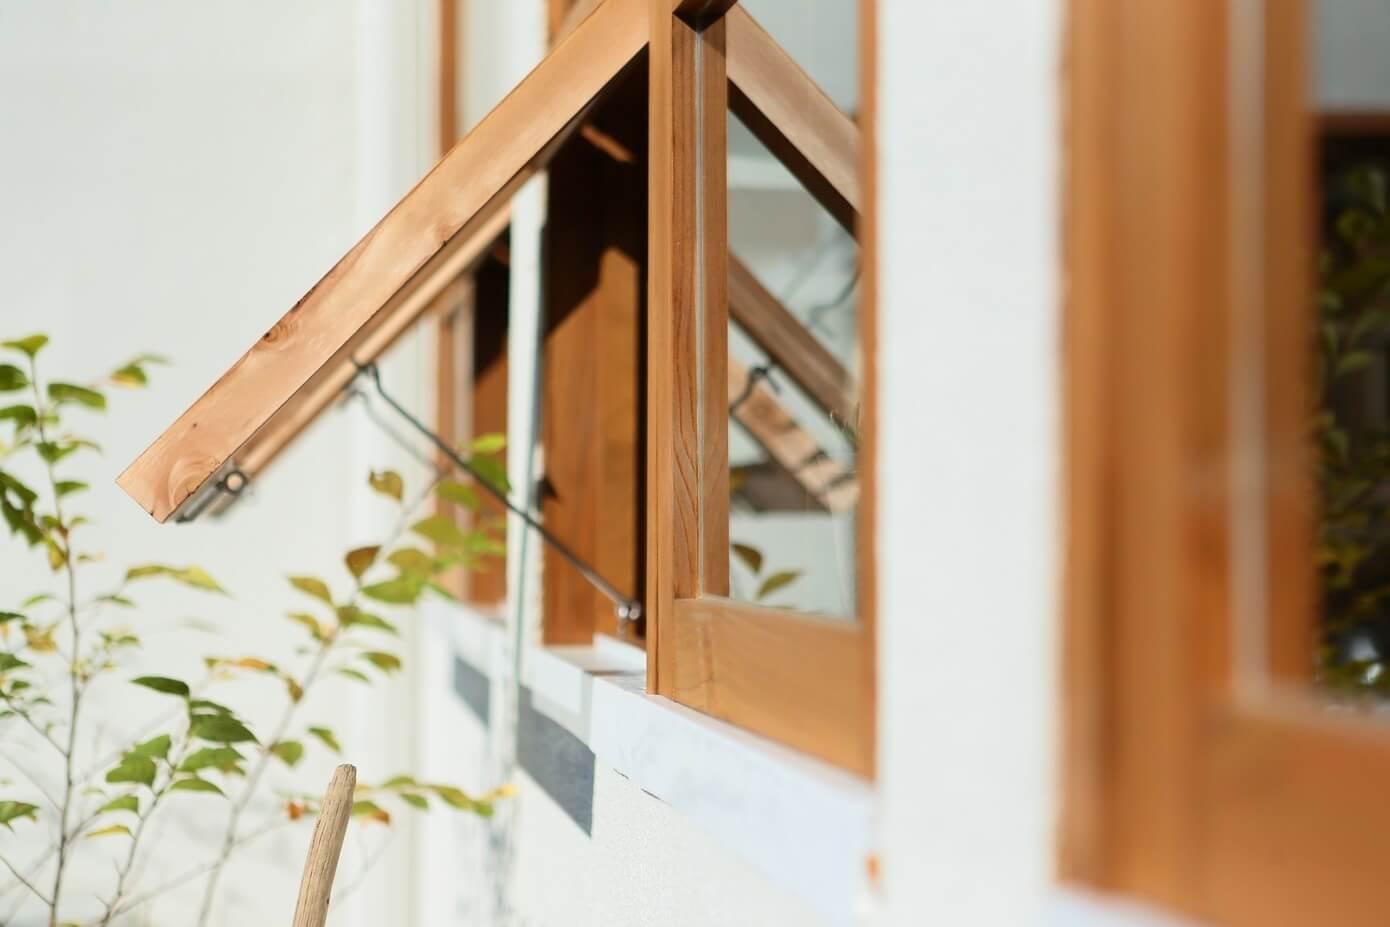 satoduto-coil-kazuteru-matumura-architects-15